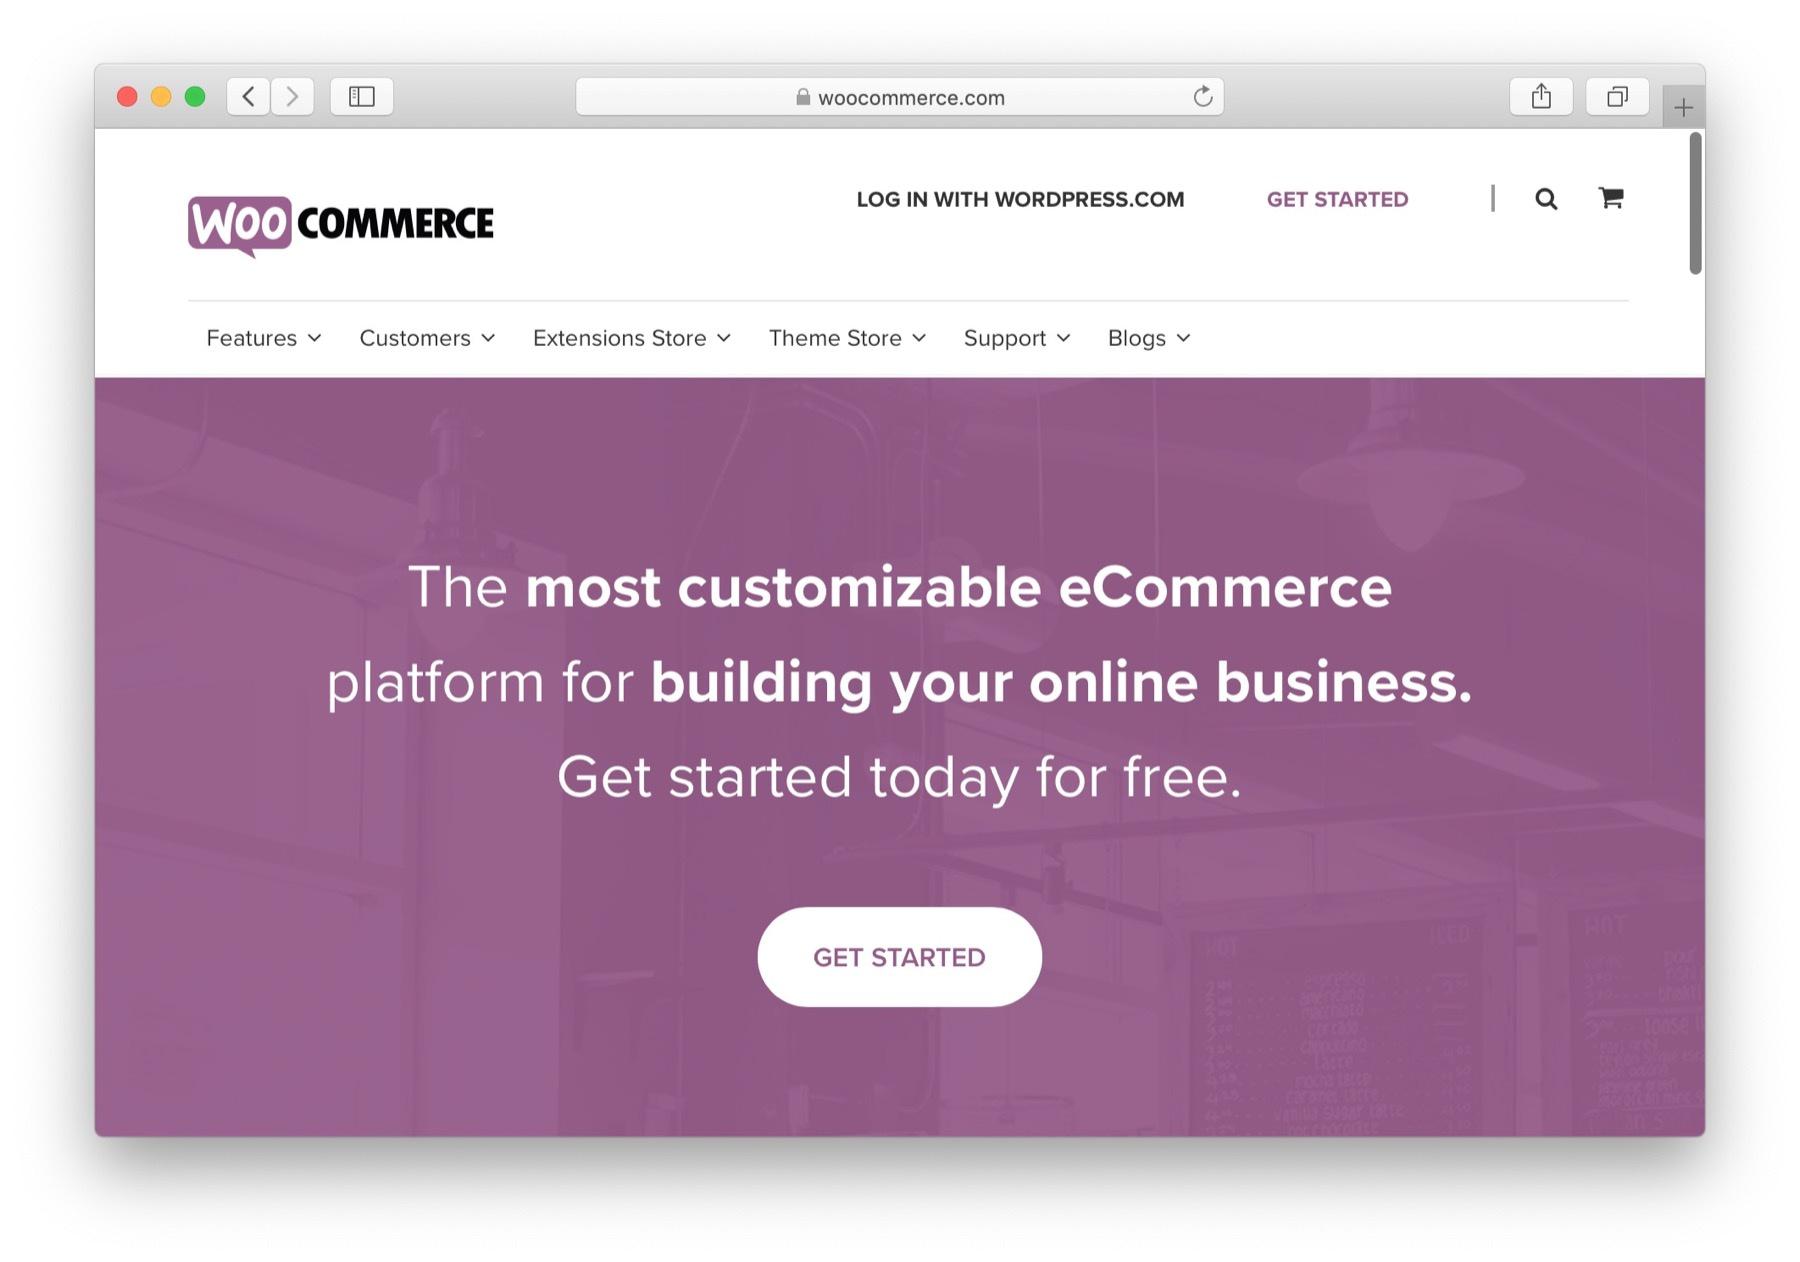 woocommerce - great platform to start eCommerce business